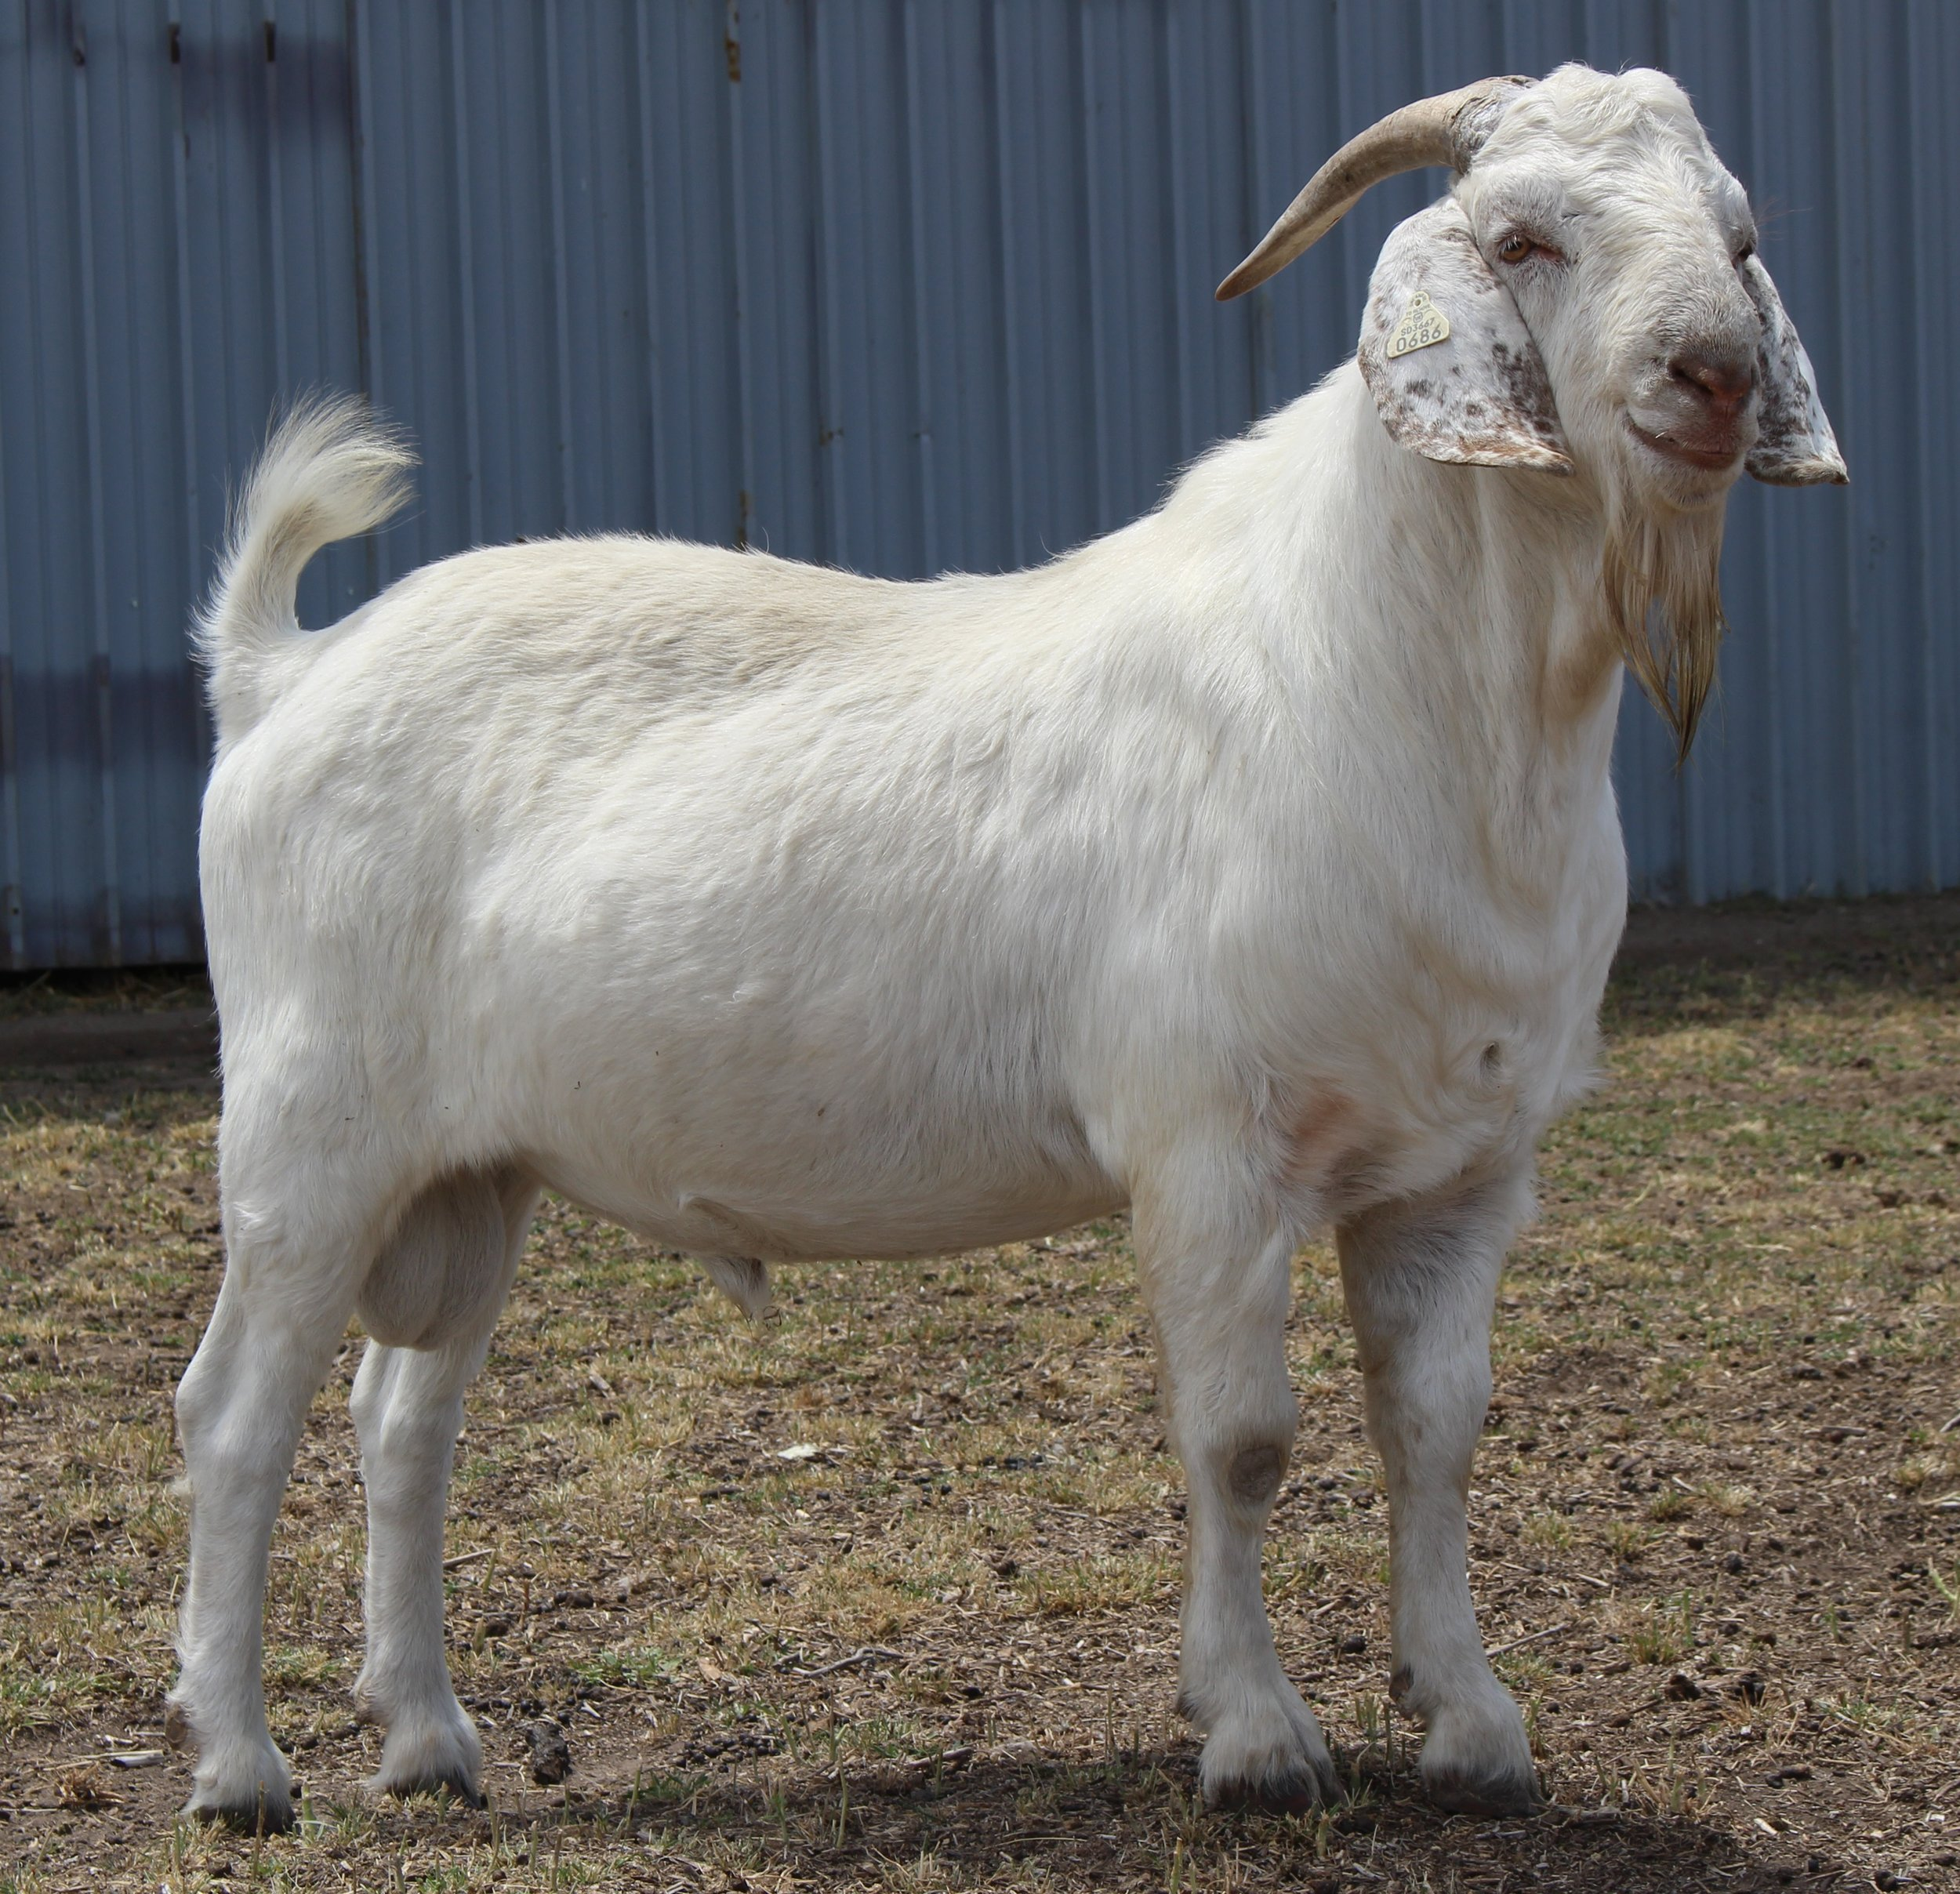 GS George   100% Fullblood DNA Registered Savanna  Dam:GS Sally  Sire: ITG B58  Date of Birth: 5/21/2017  Twin  Birth Weight:  Weaning Weight:  ADG:  CAE, Cl, Johannes clean herd.